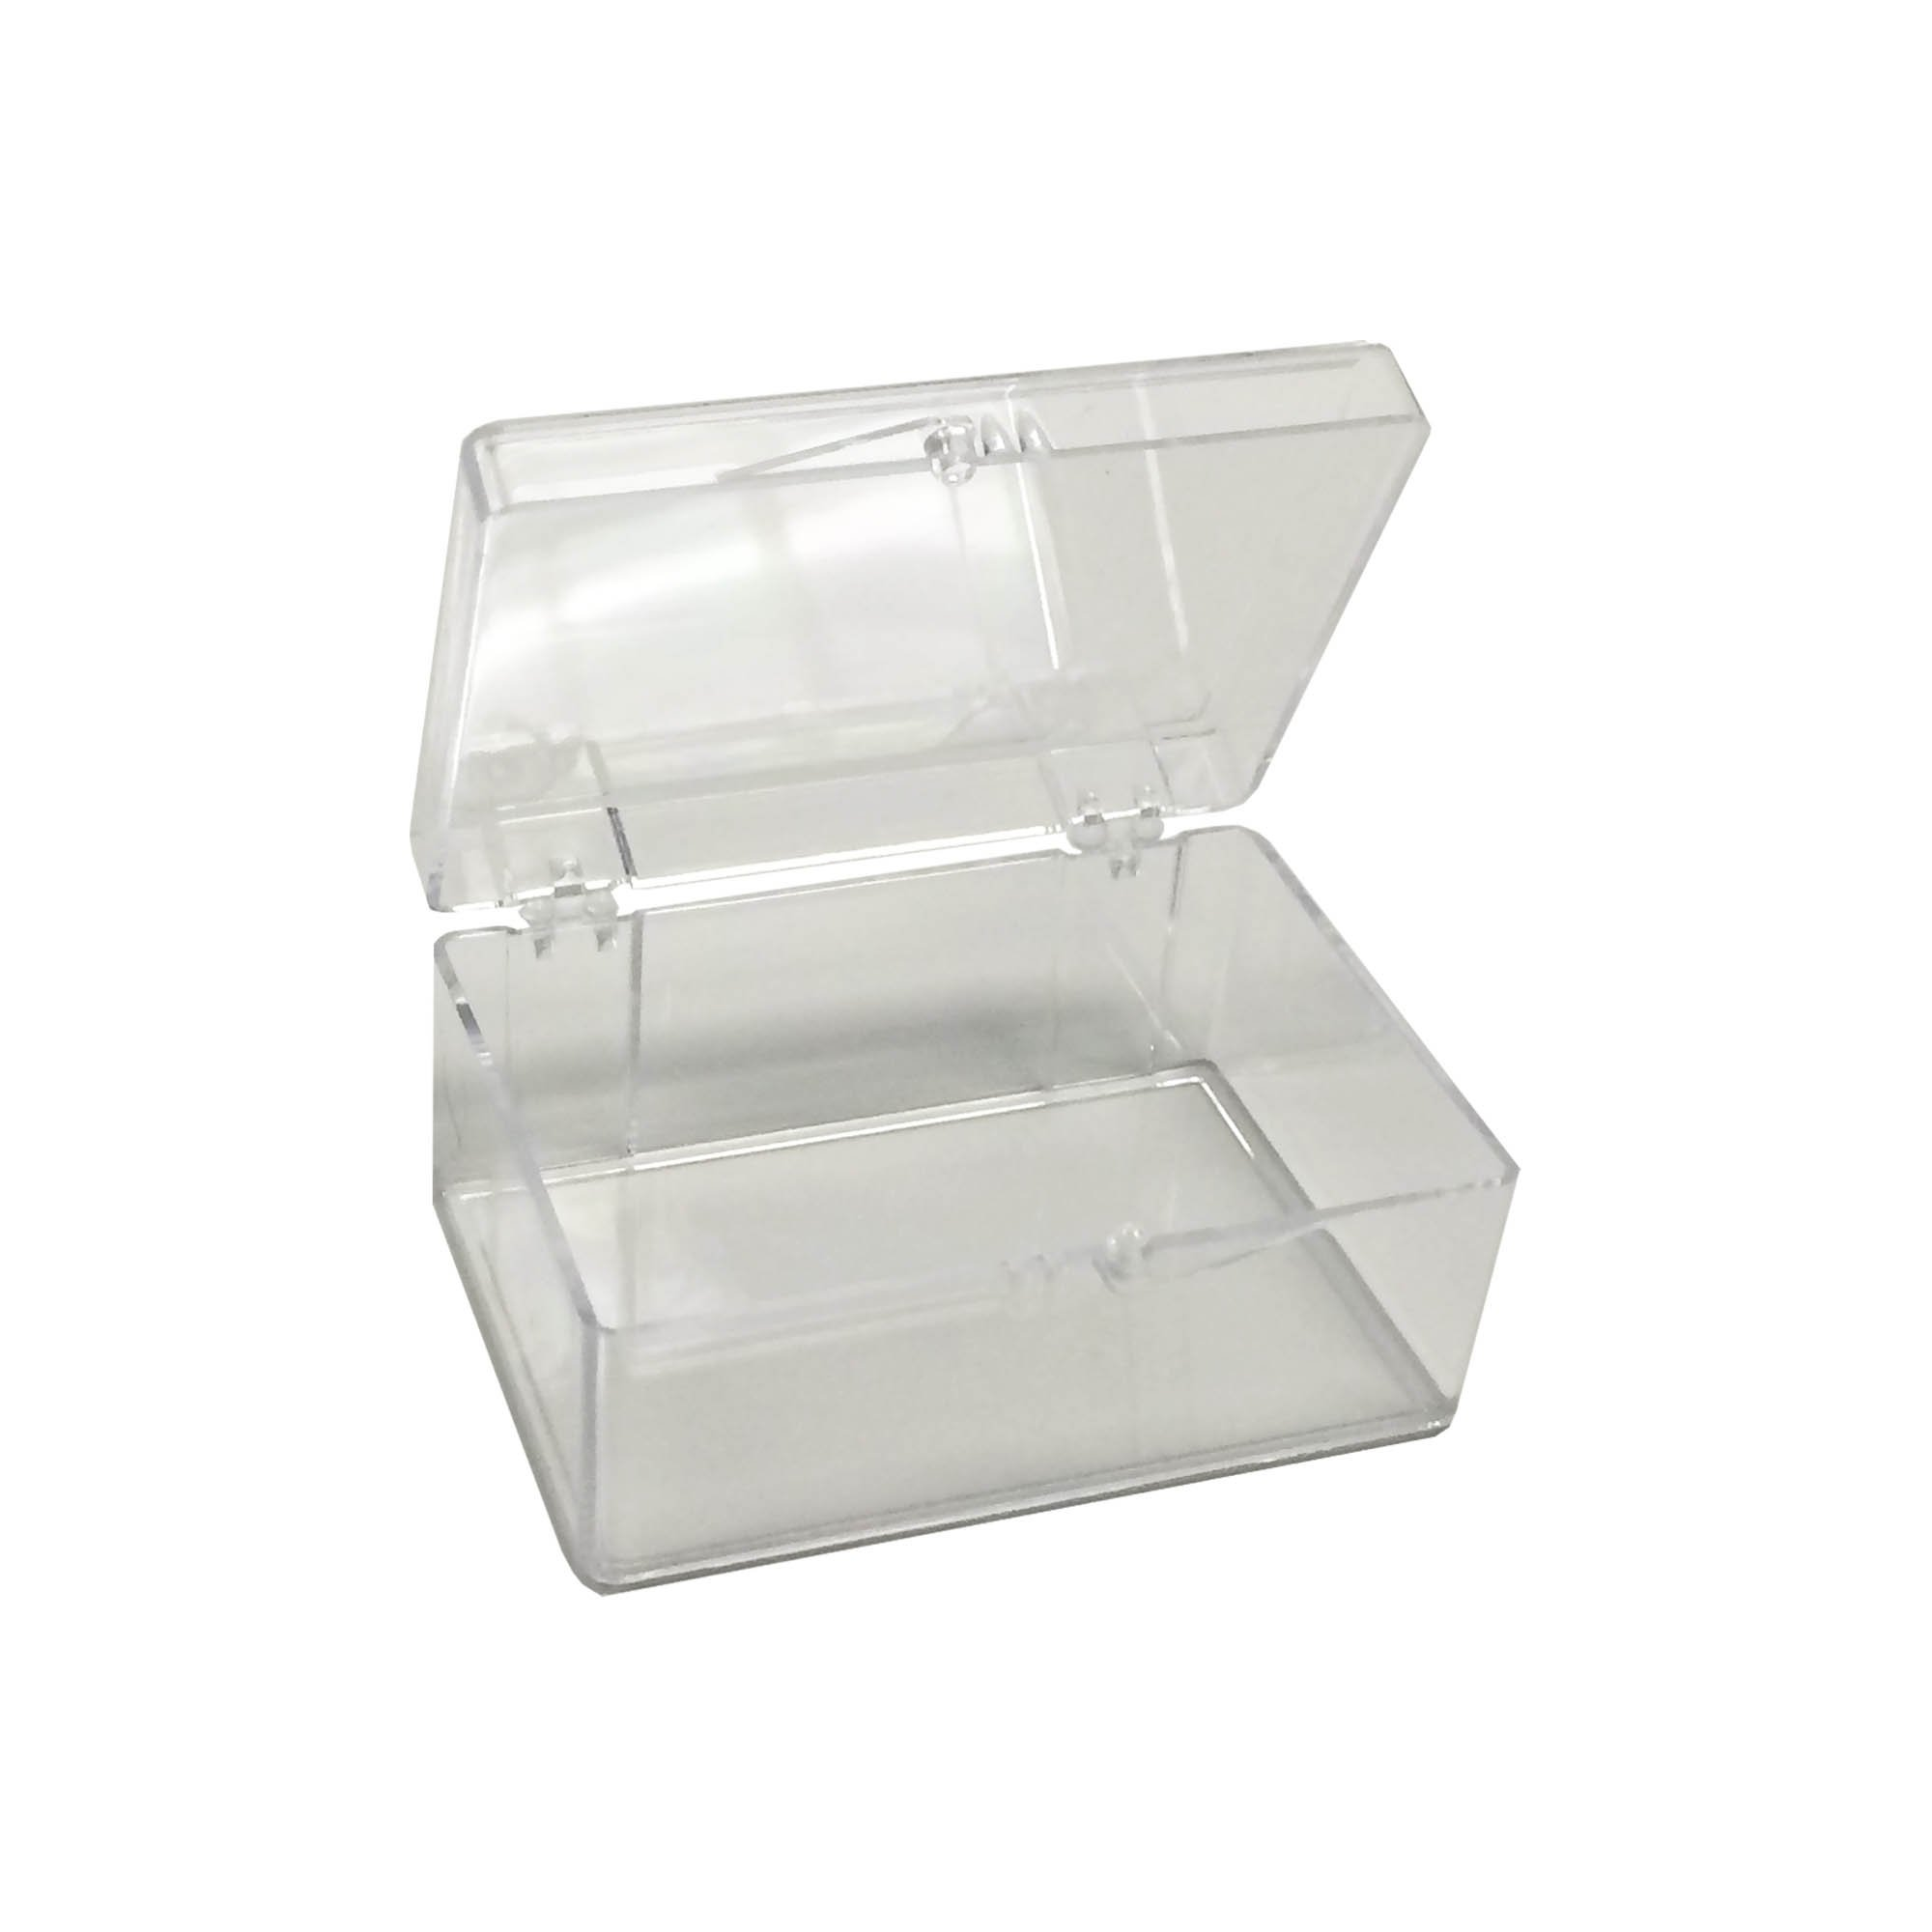 Mini-Rectangle Clear Western Blot Box - 2 7/8